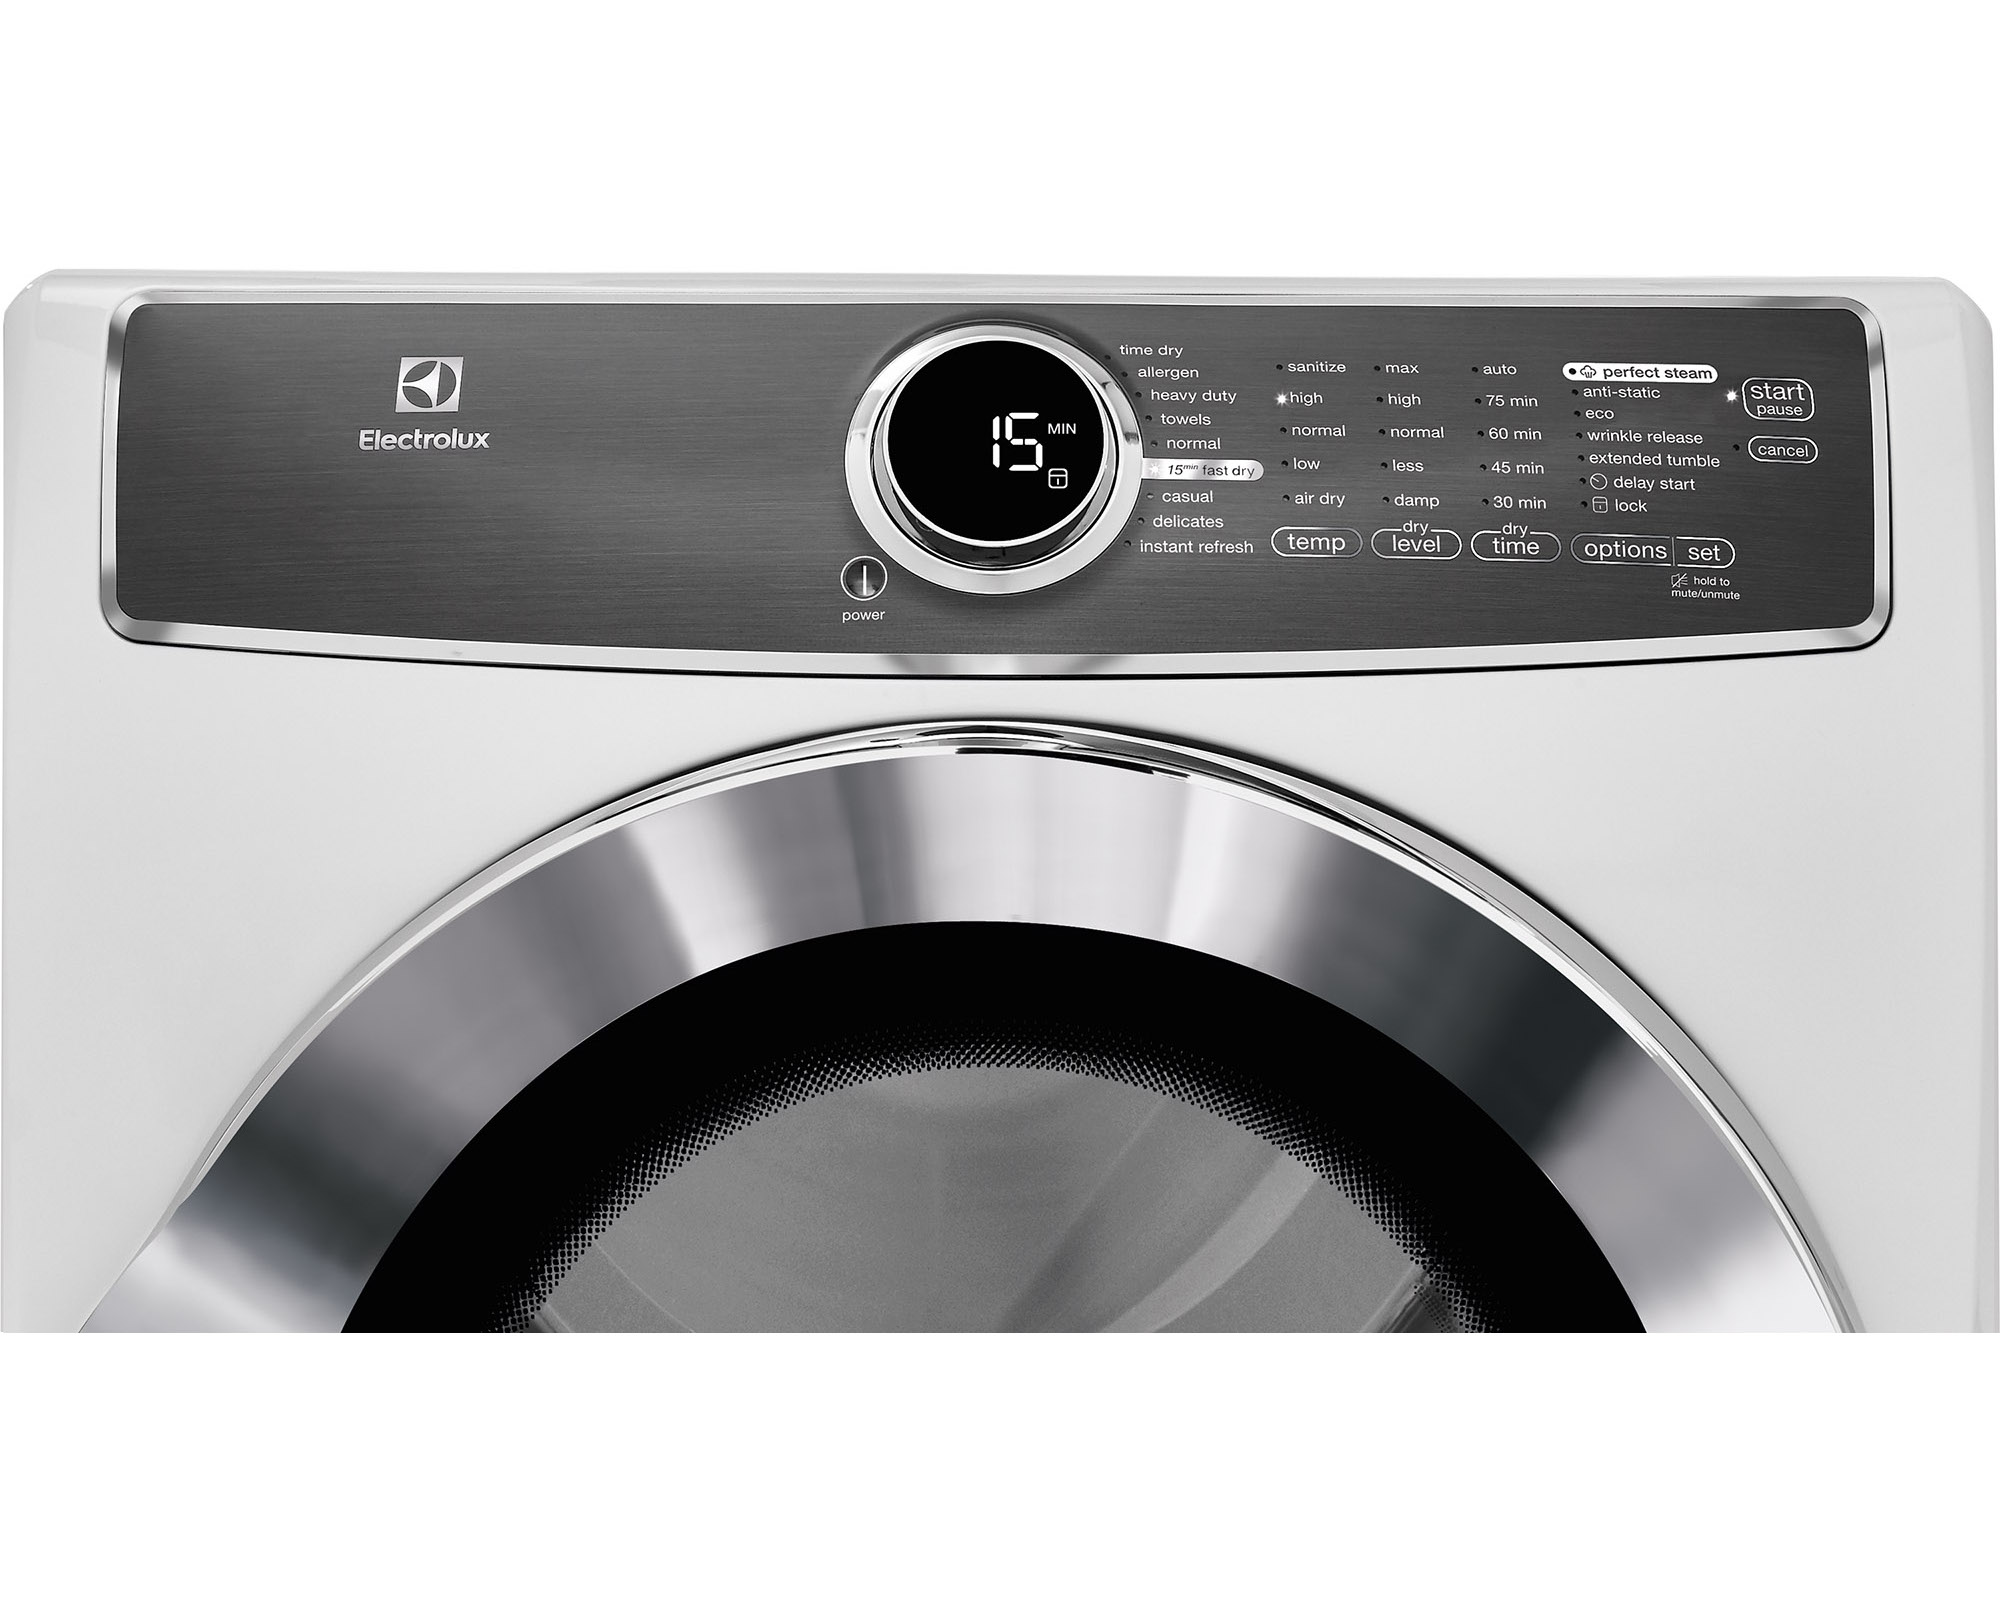 Electrolux EFMG617SIW 8.0 cu. ft. Gas Dryer w/ Allergen Cycle - White